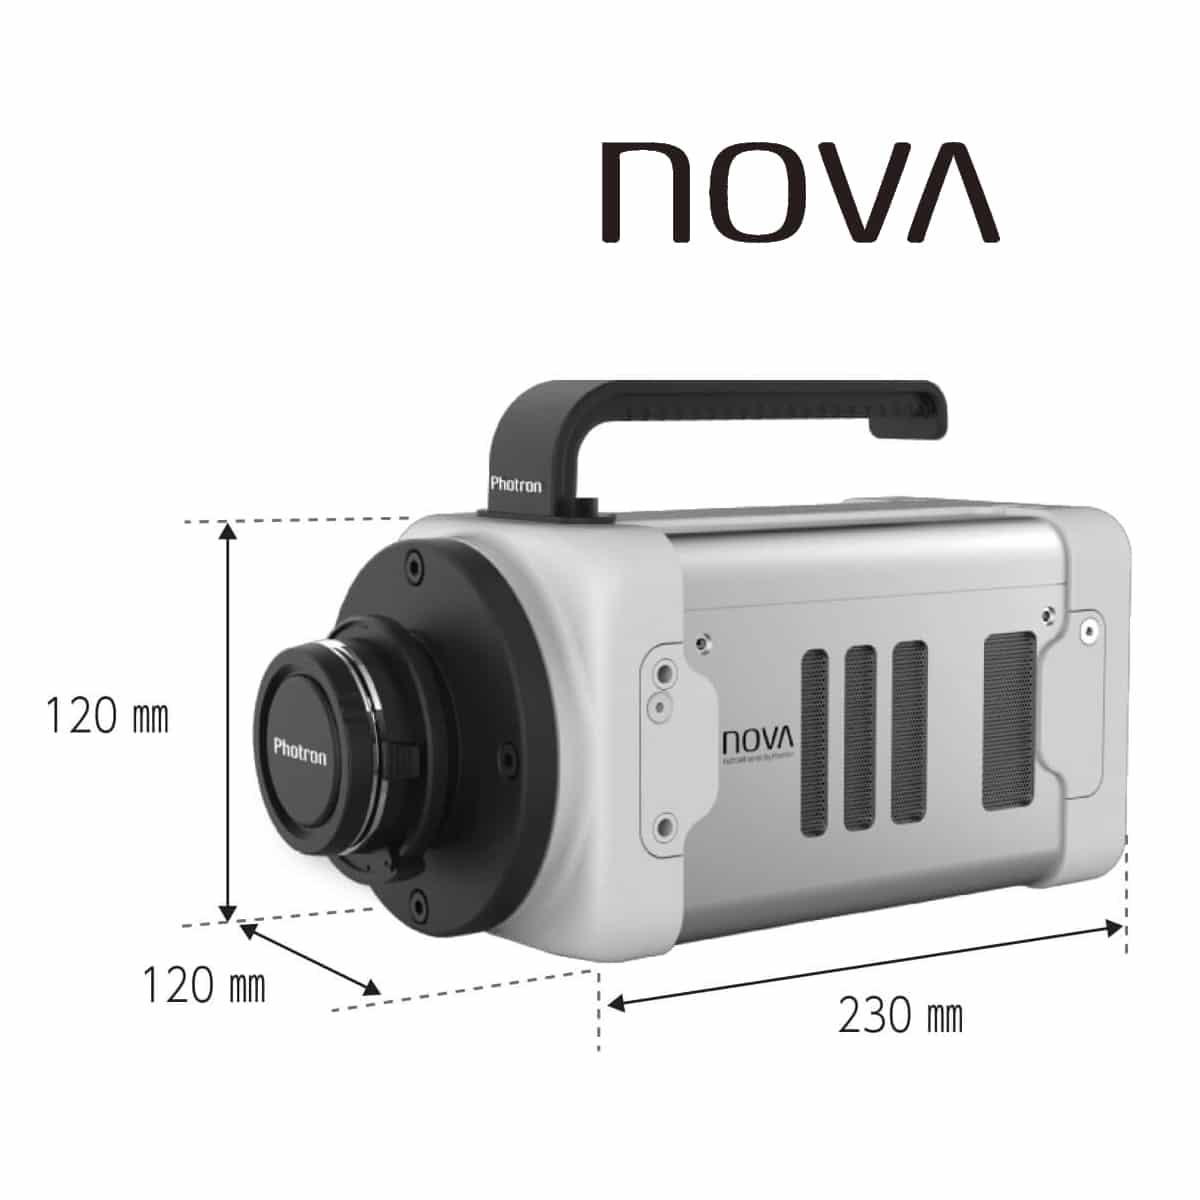 Produktbild Photron FASTCAM NOVA S-Serie, Abmessungen